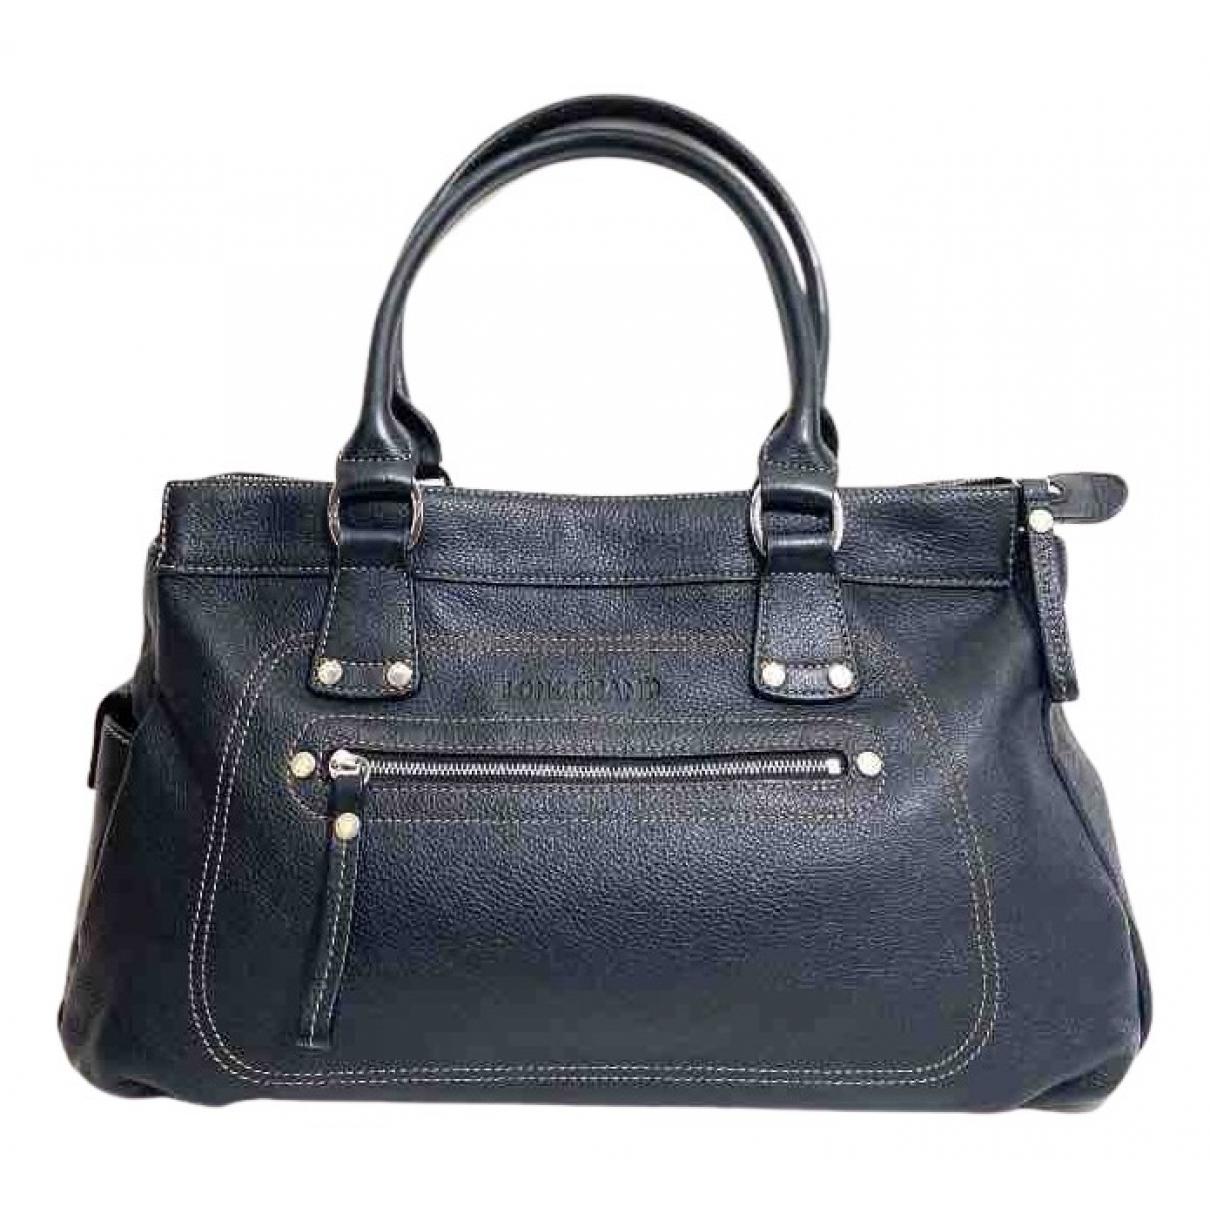 Longchamp Legende Handtasche in  Schwarz Leder